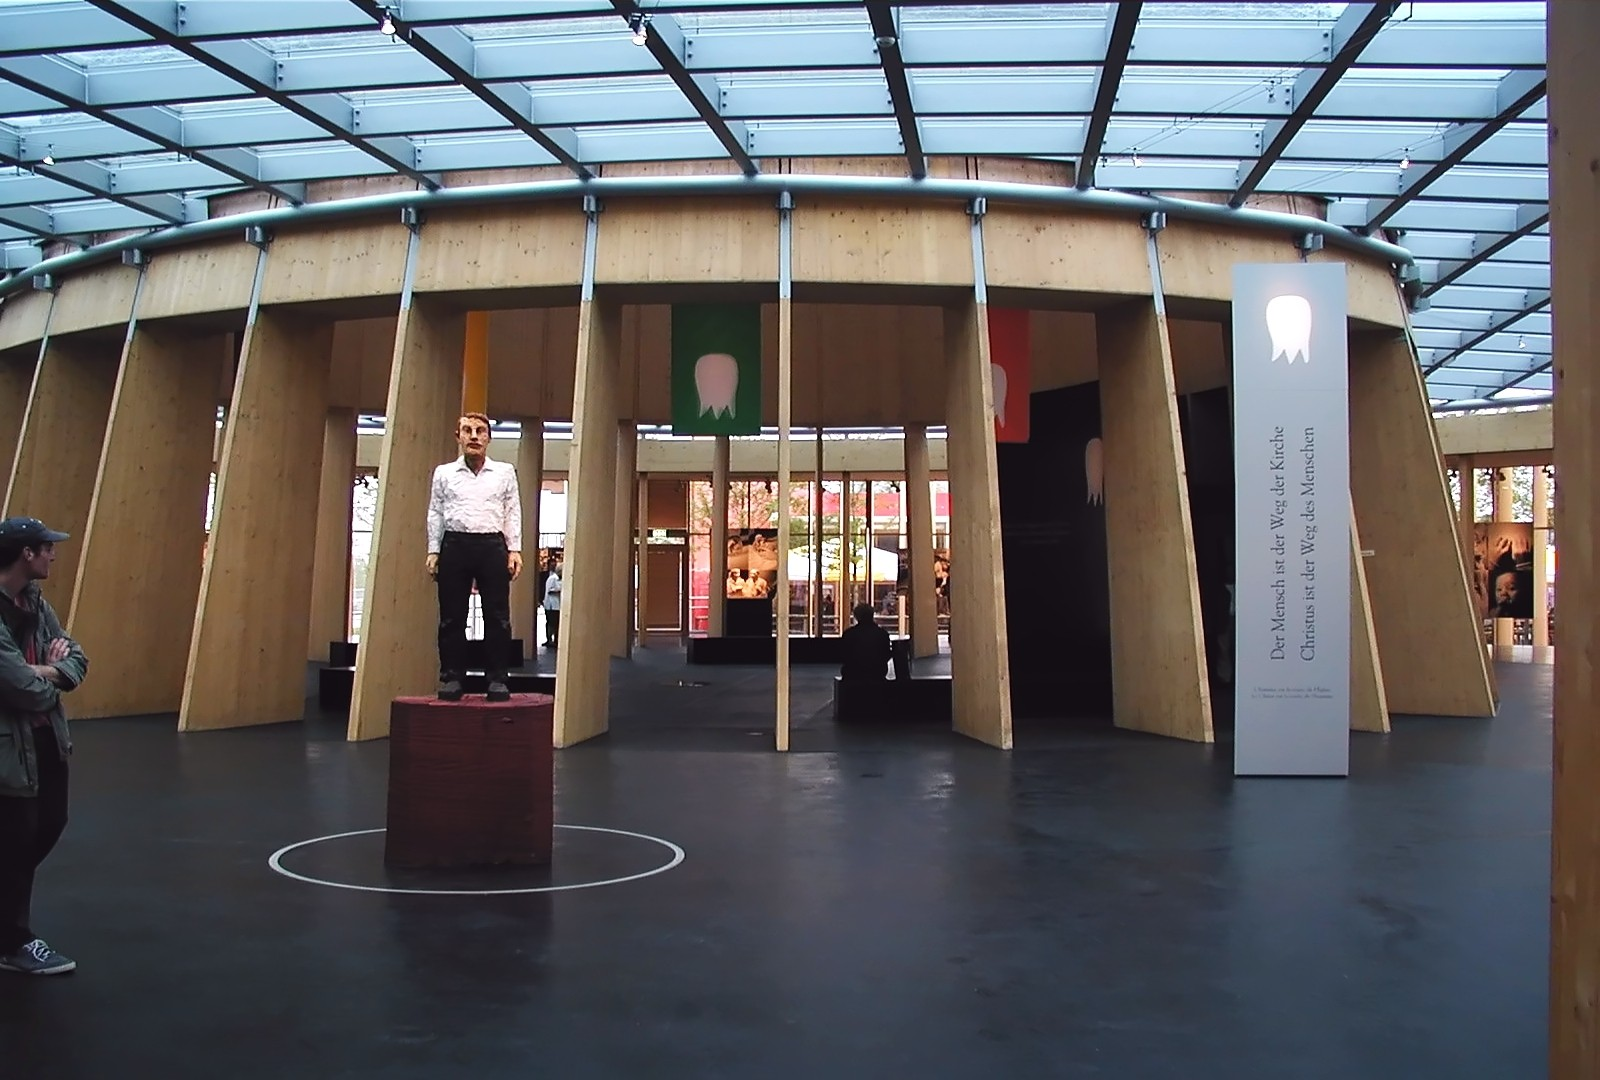 Exhibition Display Design : Exhibition design vatican pavilion